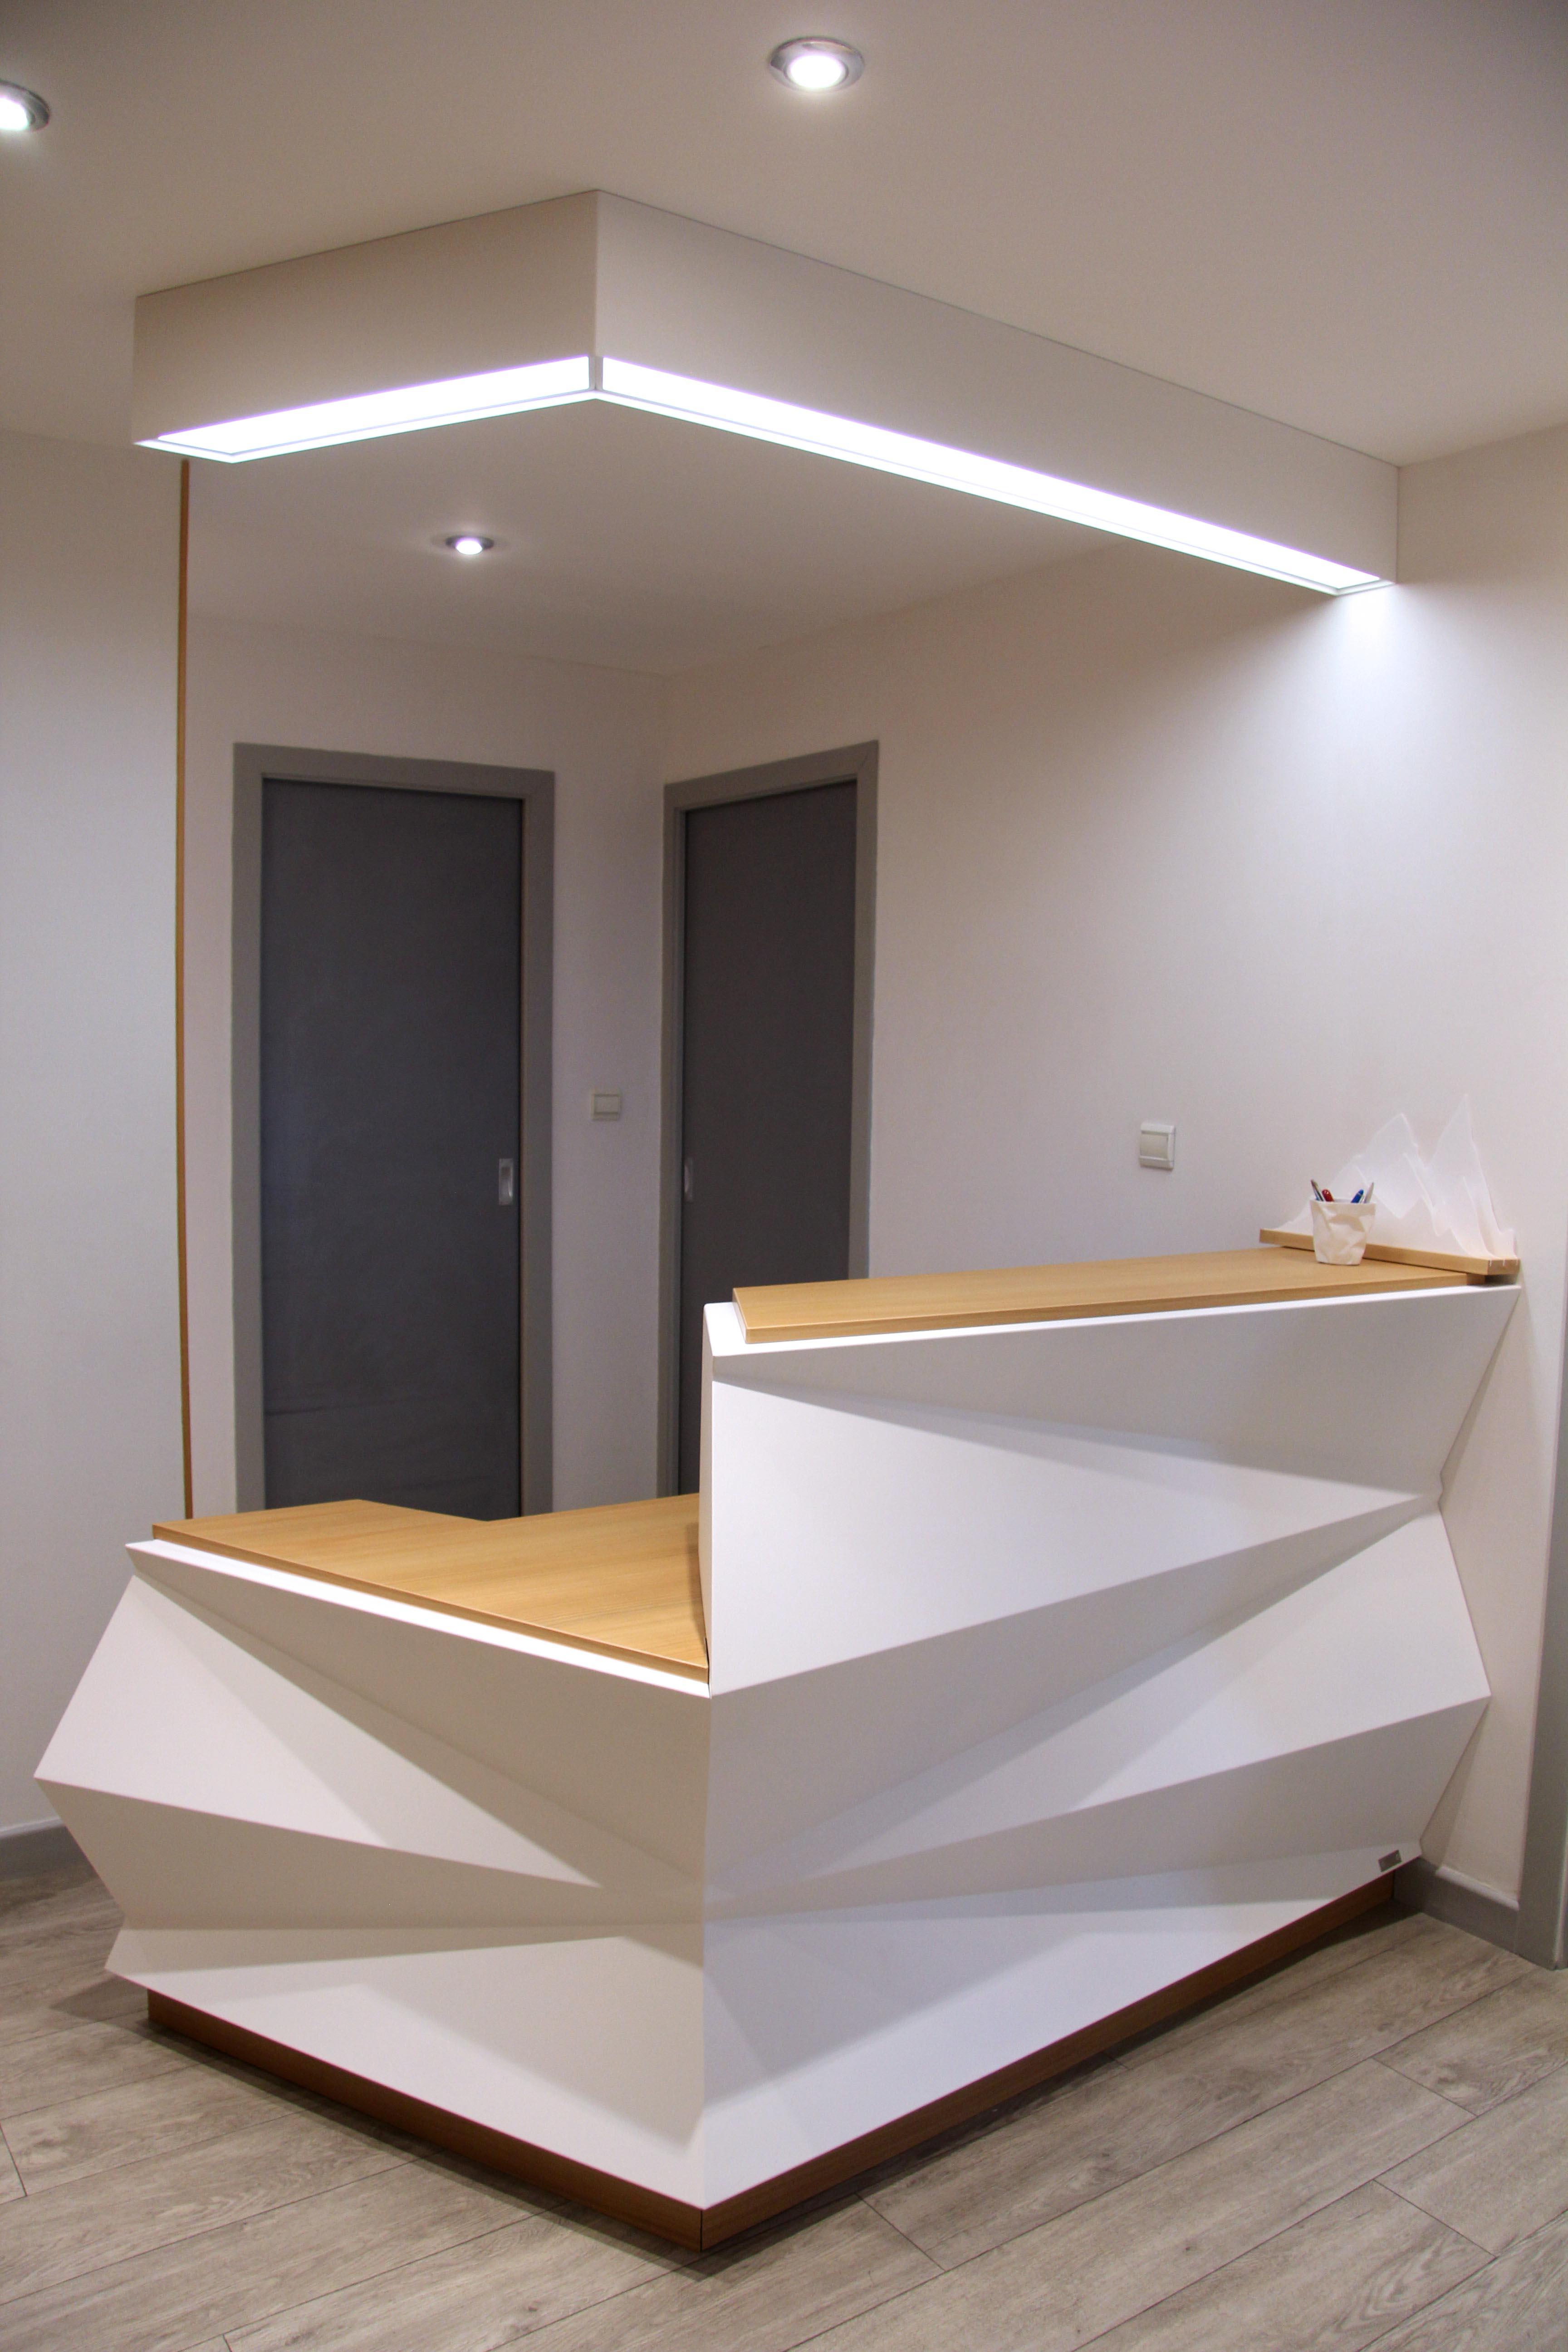 Banque D Accueil Origami En M 233 Tal Fabricant Meuble Metal